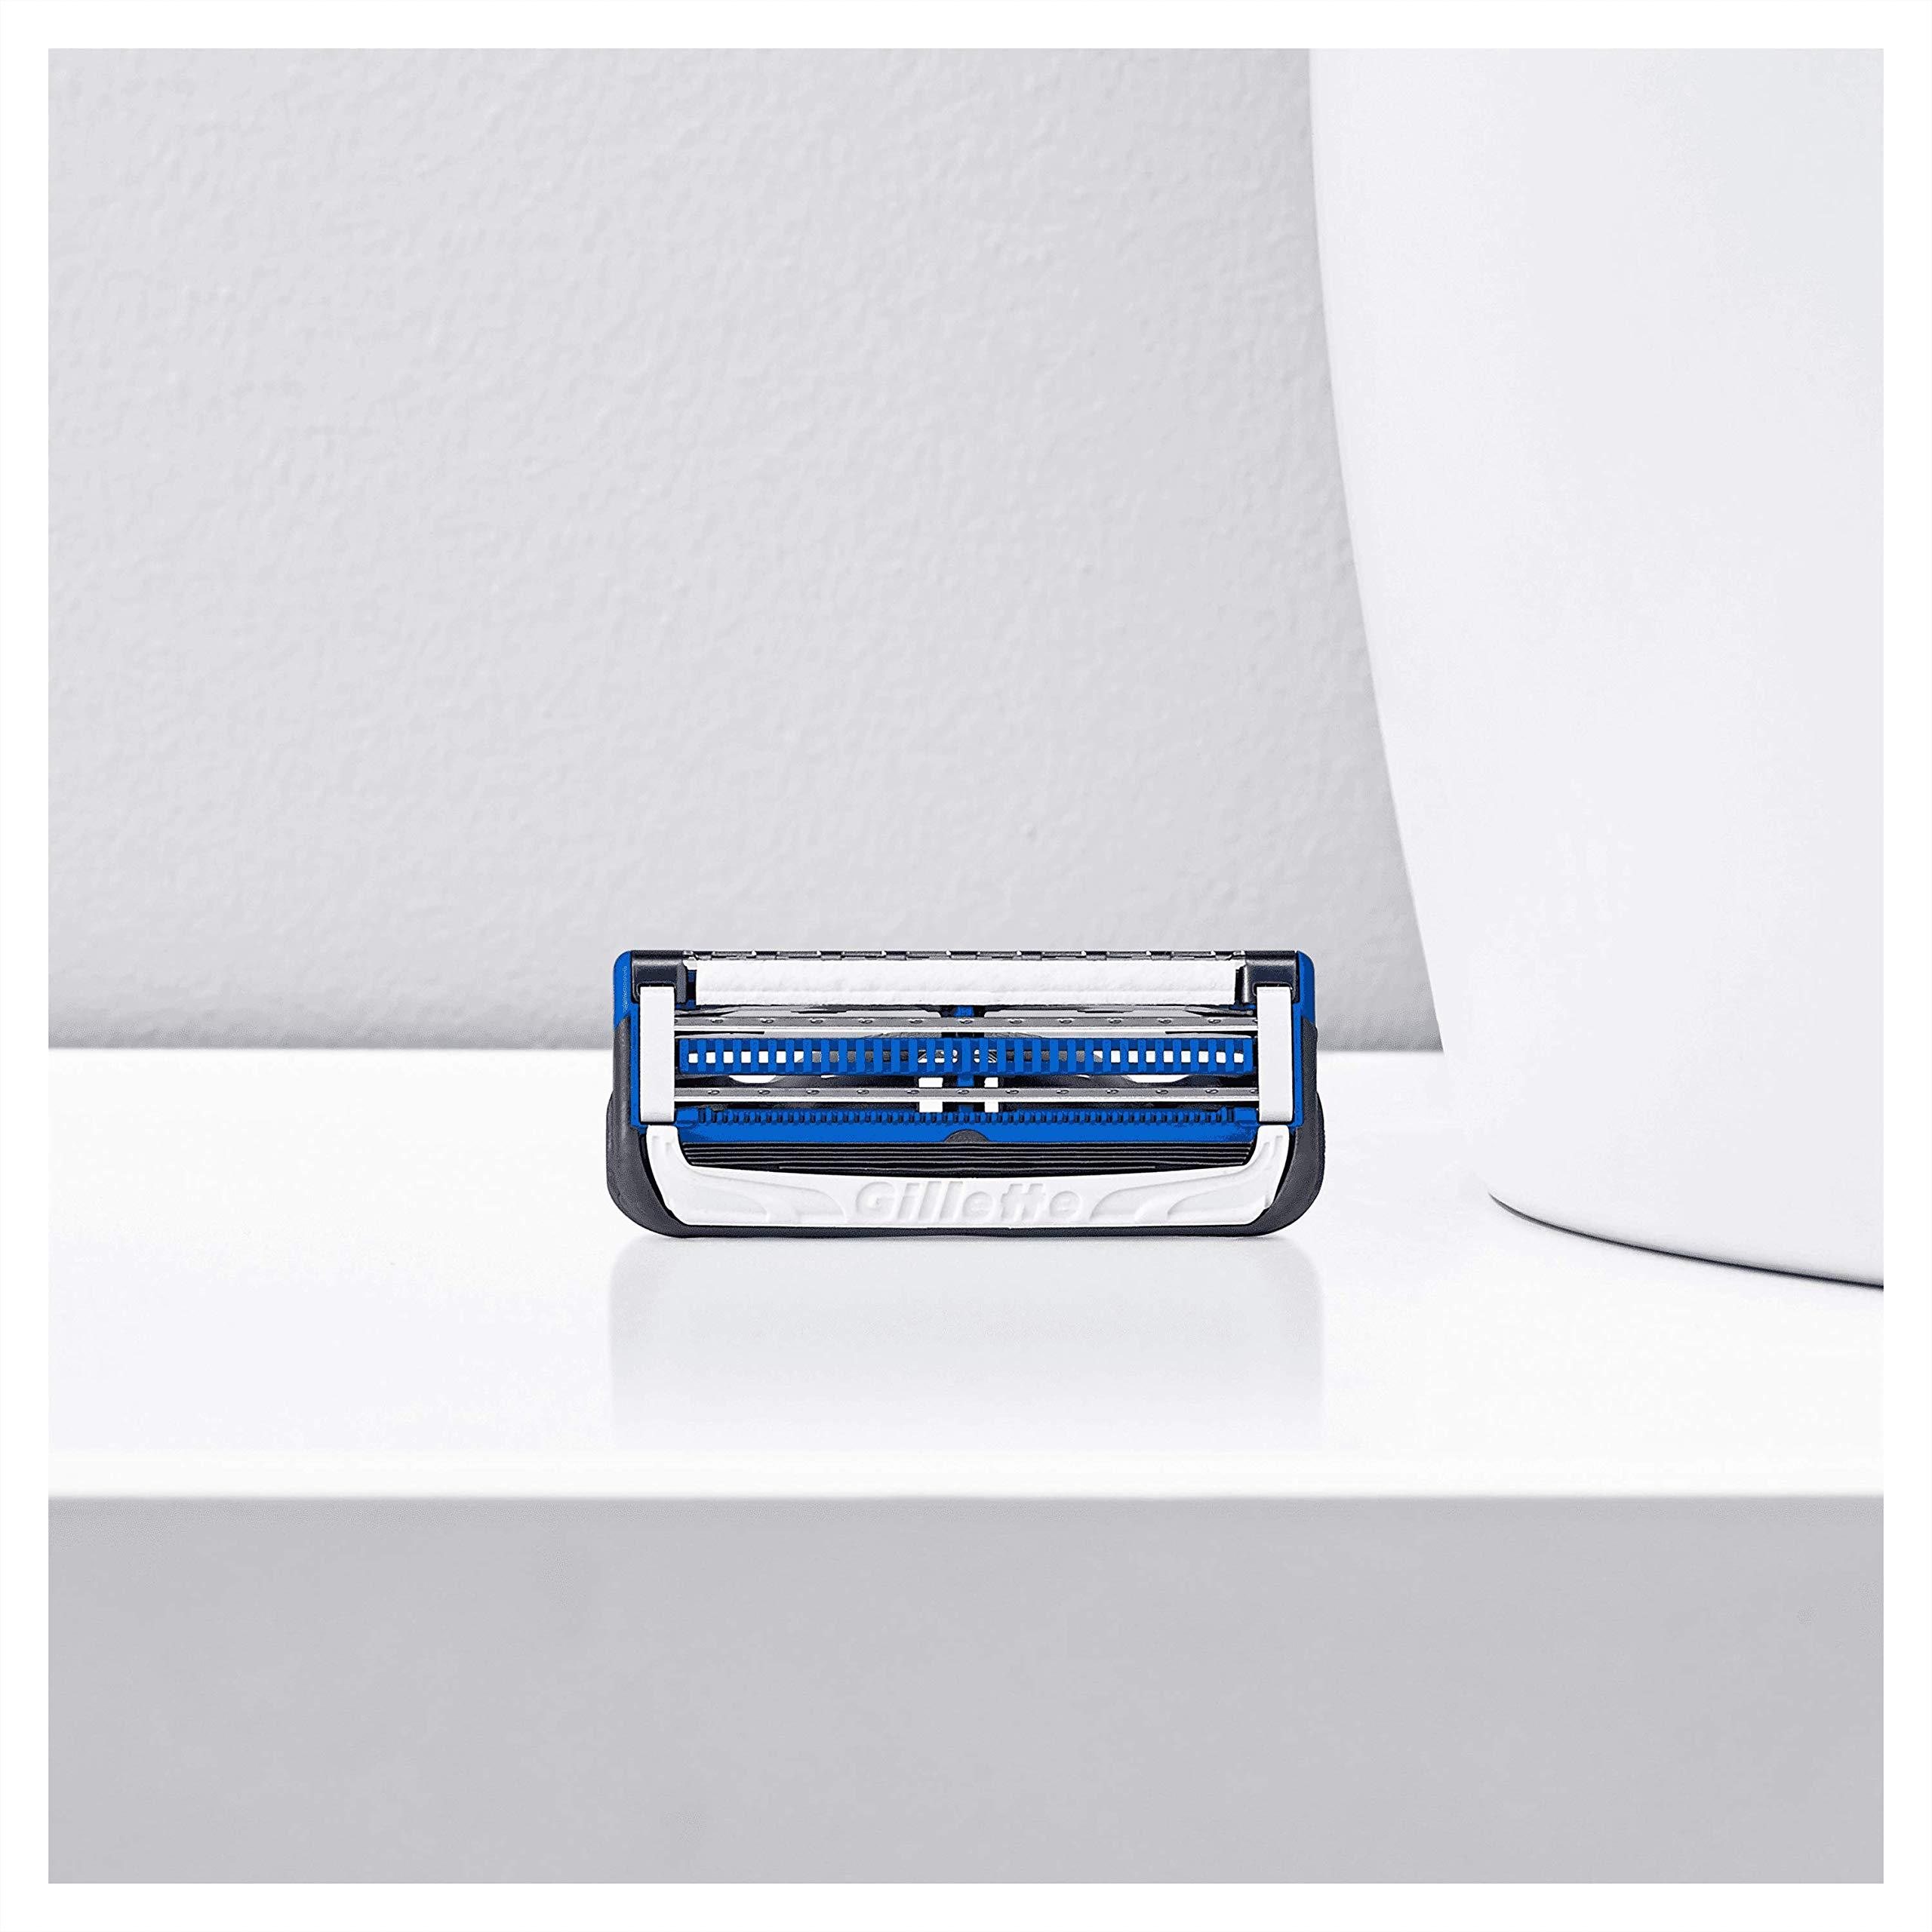 Gillette Gift Set with SkinGuard White Razor Premium Edition for Men + Magnetic Razor Stand